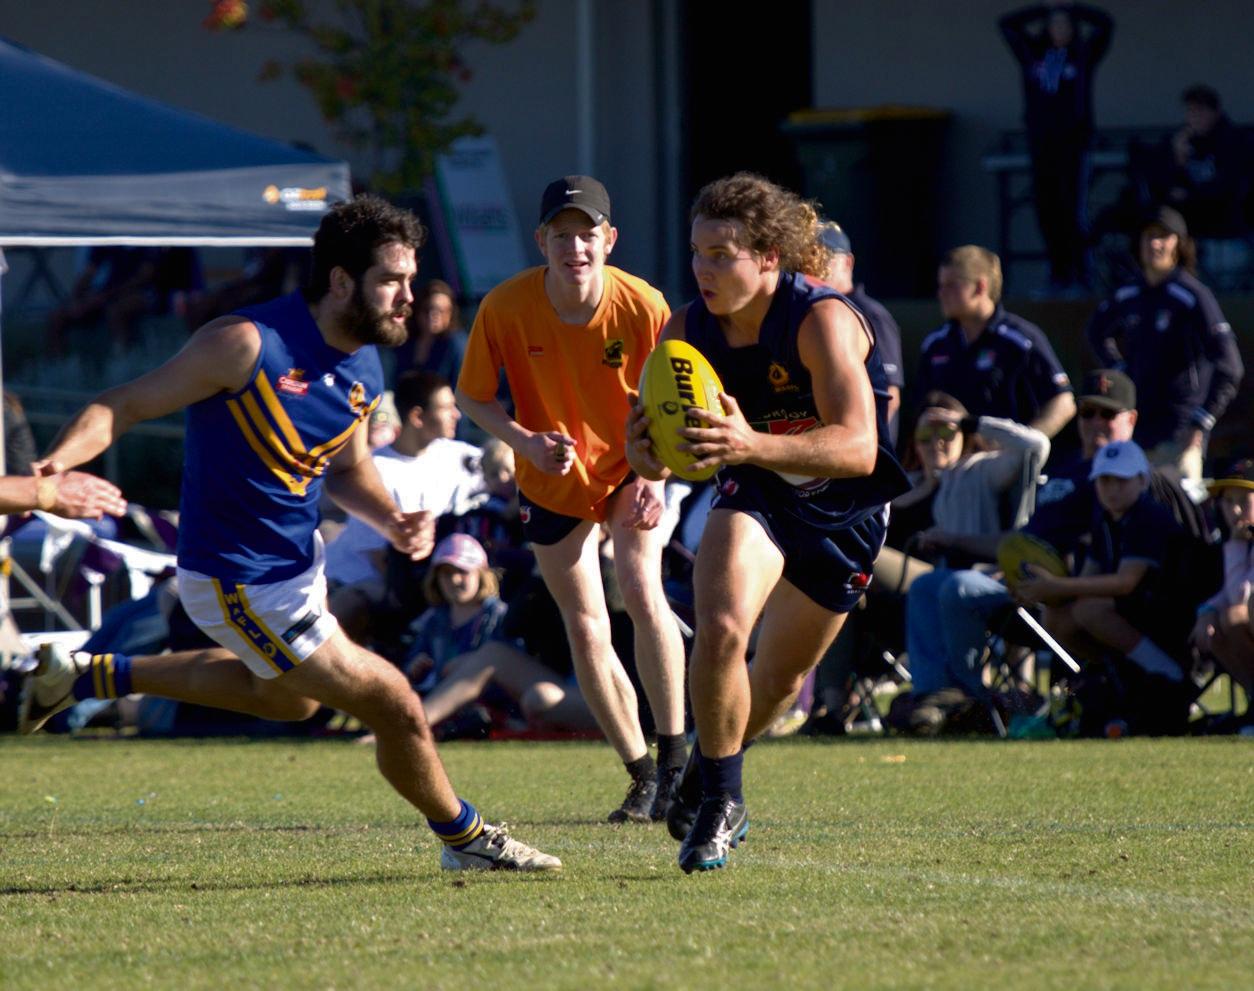 Bradley Lurkin works the ball around the boundary line under close eye of the umpire.